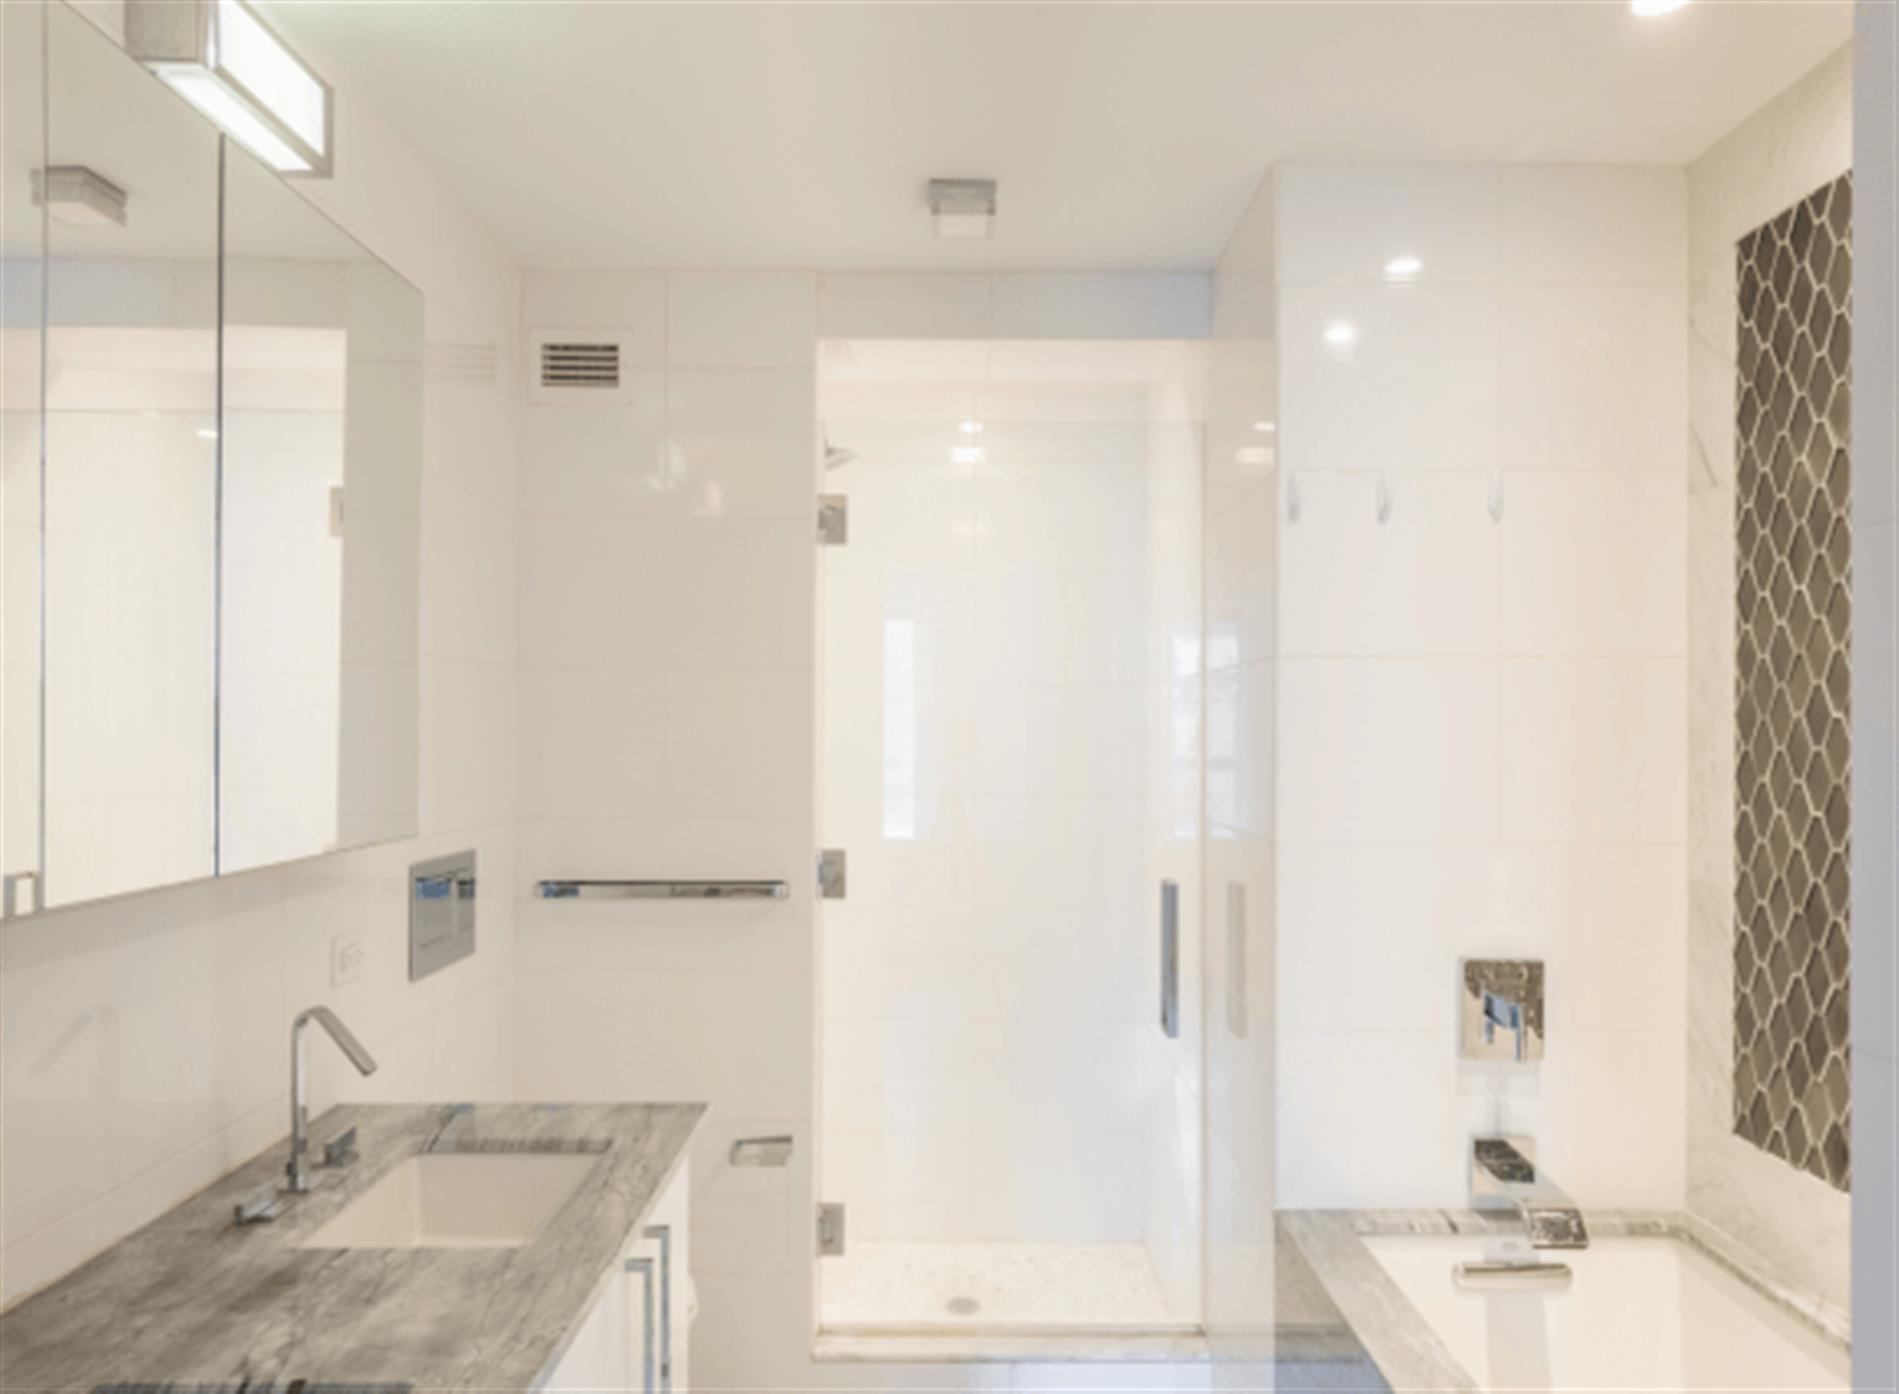 Luxurious 3Bed/3.5Bath UWS Home Near Riverside Park